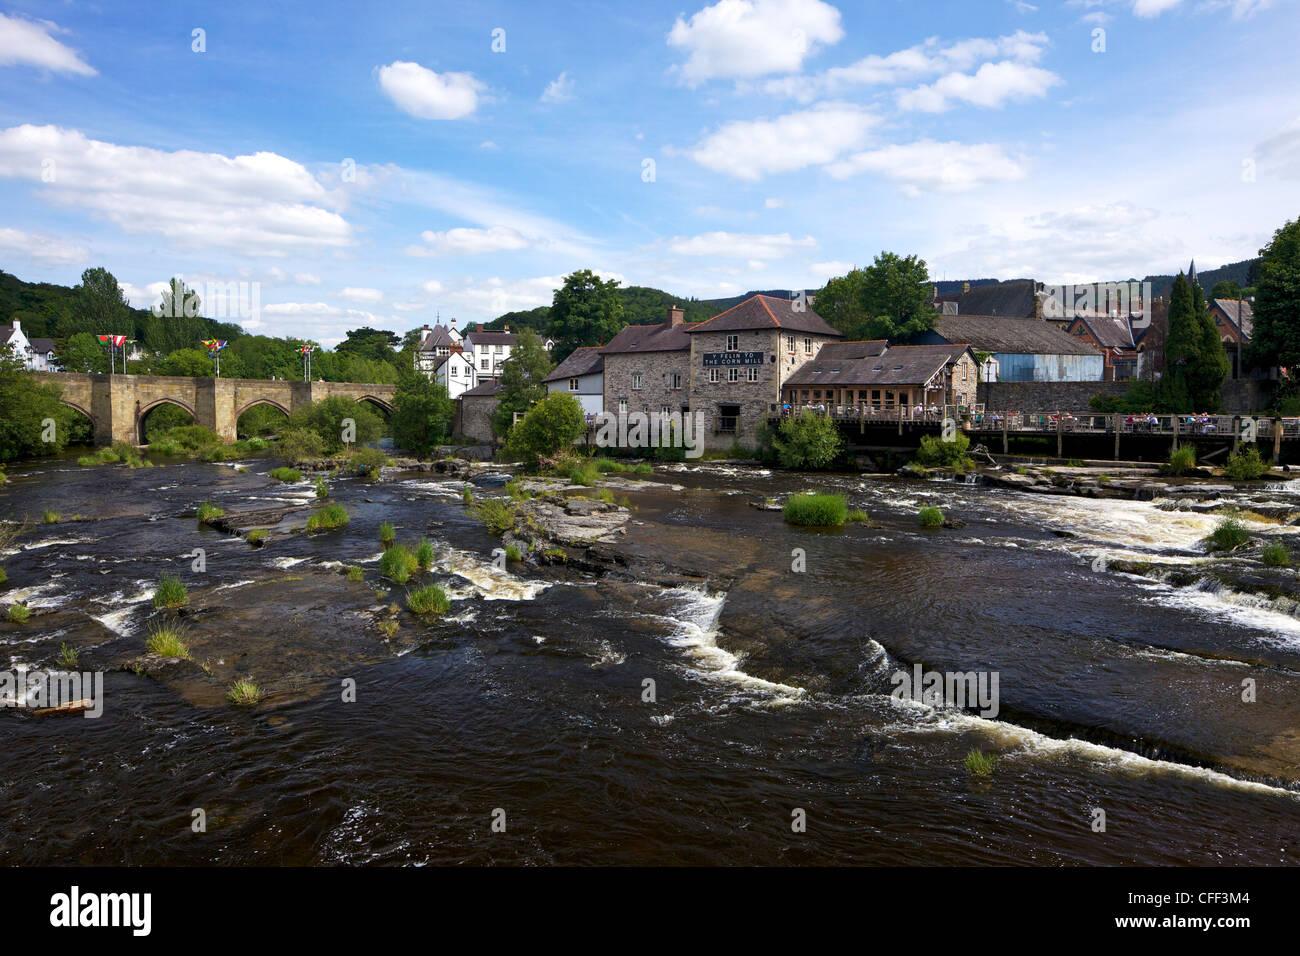 Stone bridge across the river Dee, Llangollen, Denbighshire, Wales, UK Stock Photo